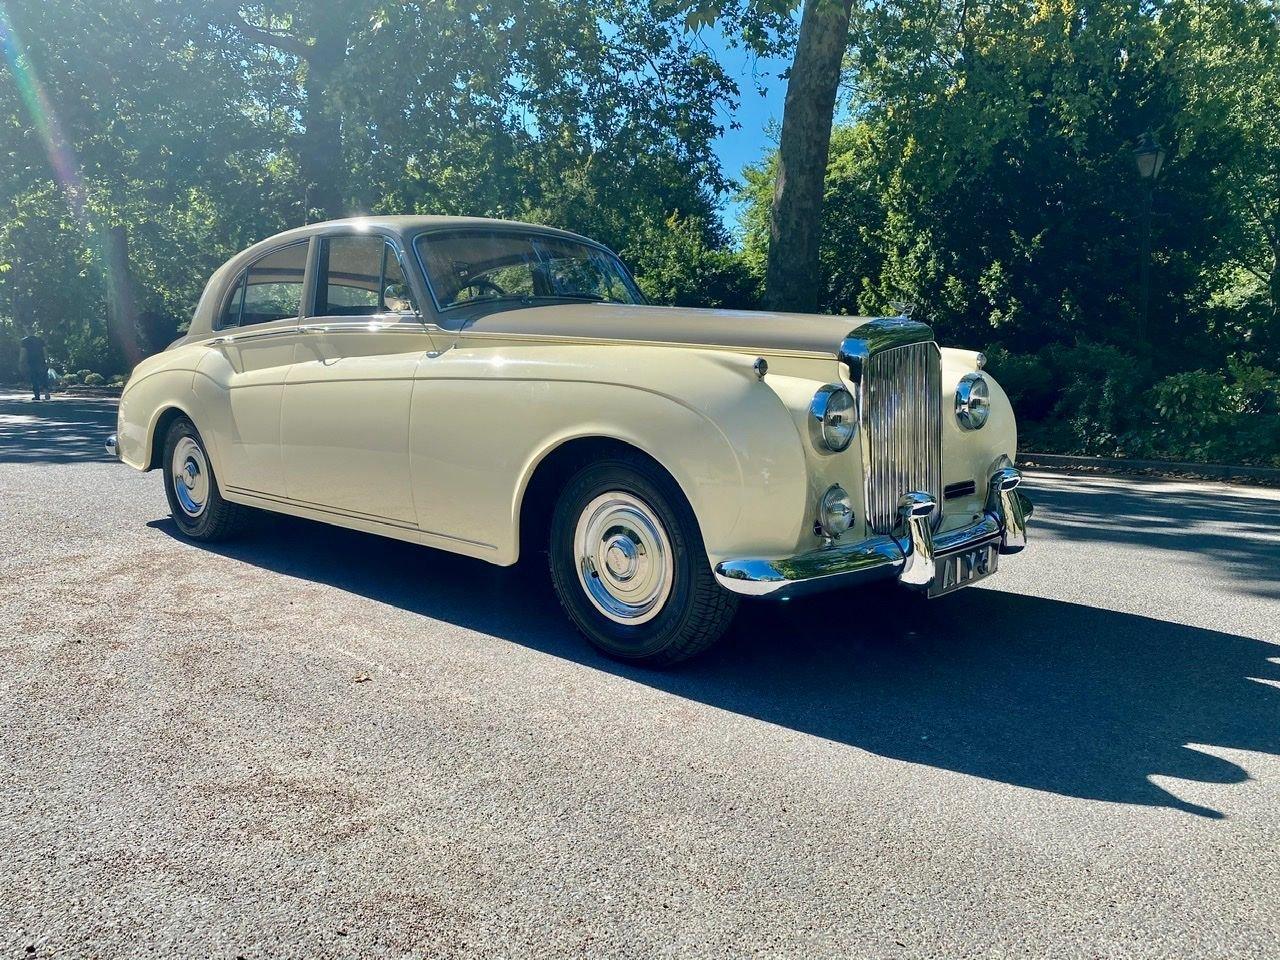 1958 Bentley S1 4 door saloon by James Young For Sale (picture 2 of 24)